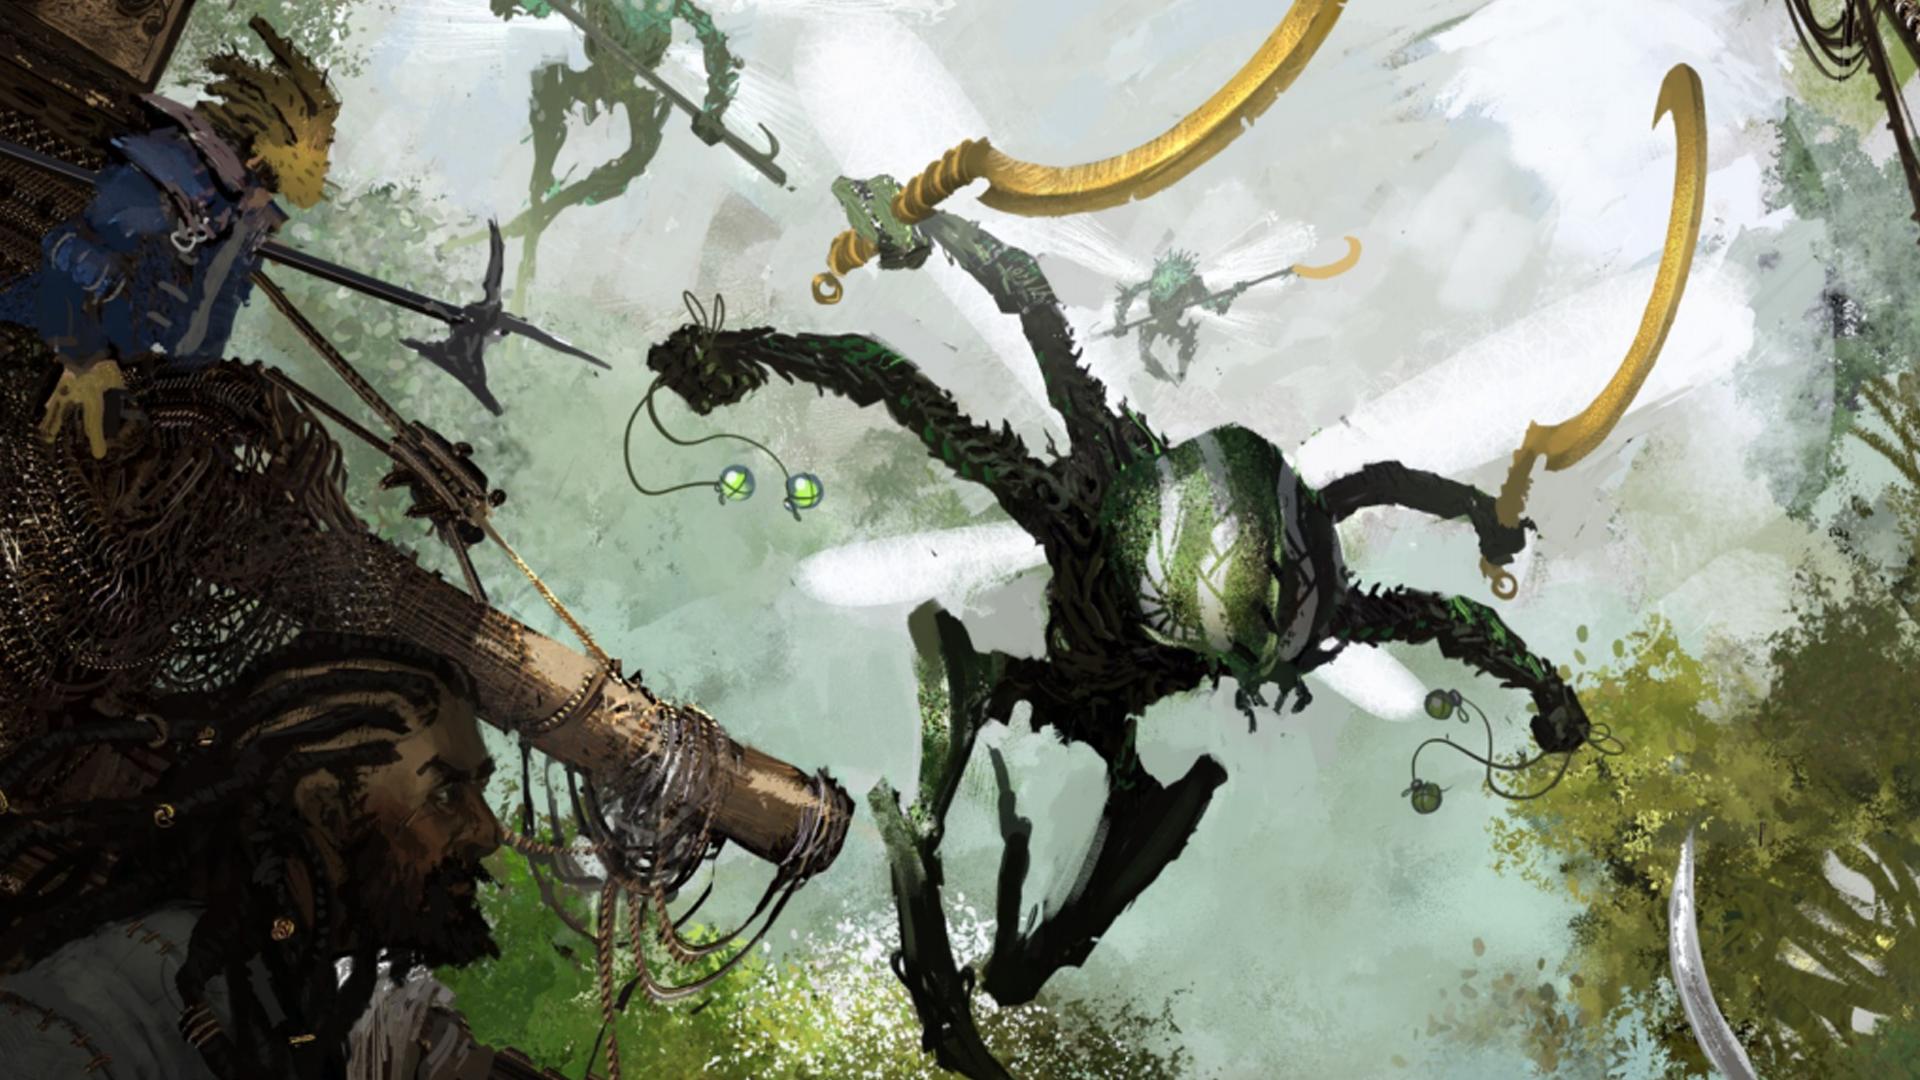 Wildsea RPG cover artwork